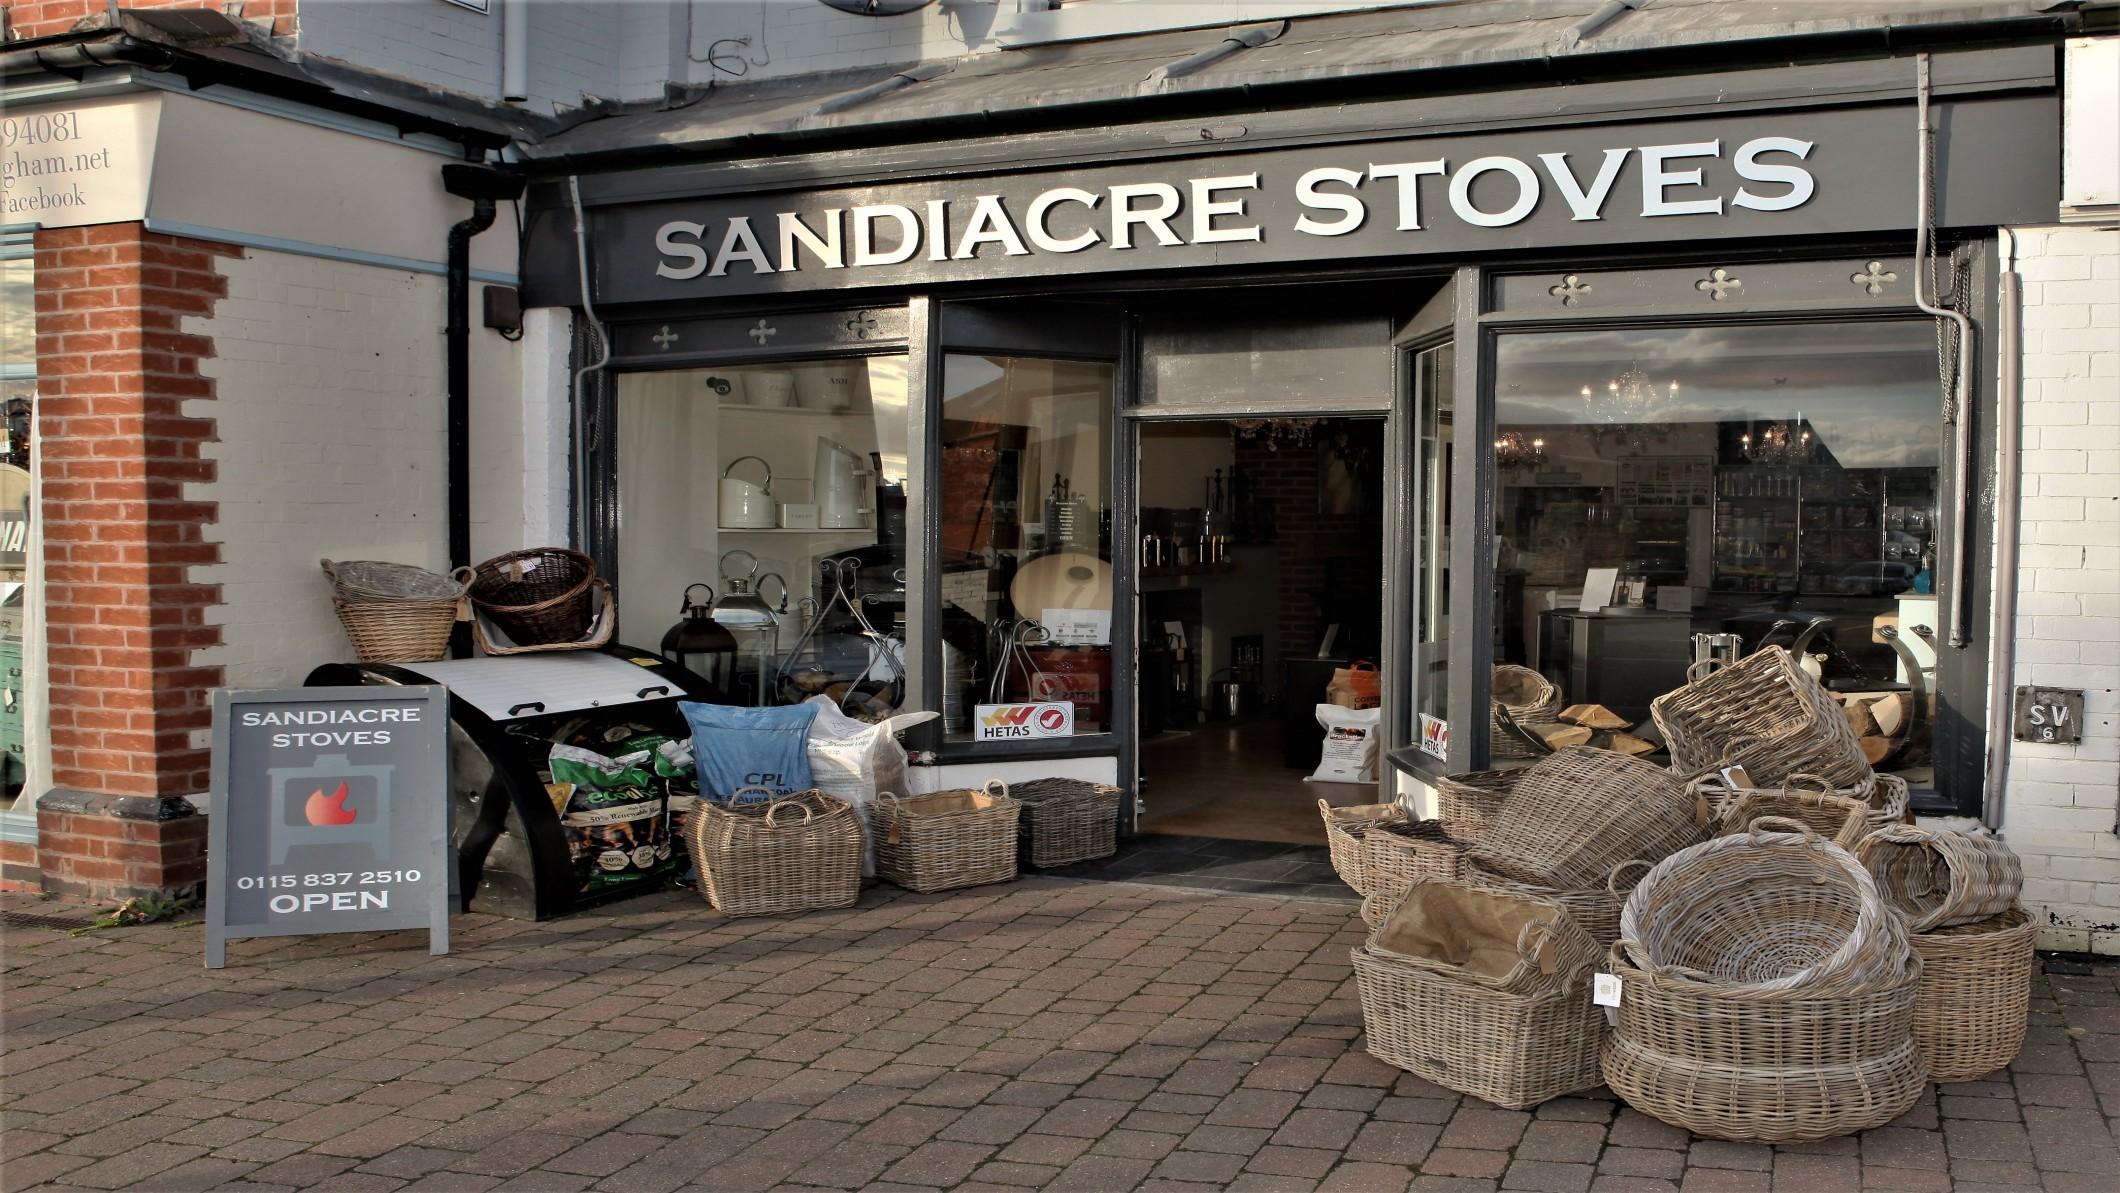 Sandiacre Stoves Ltd